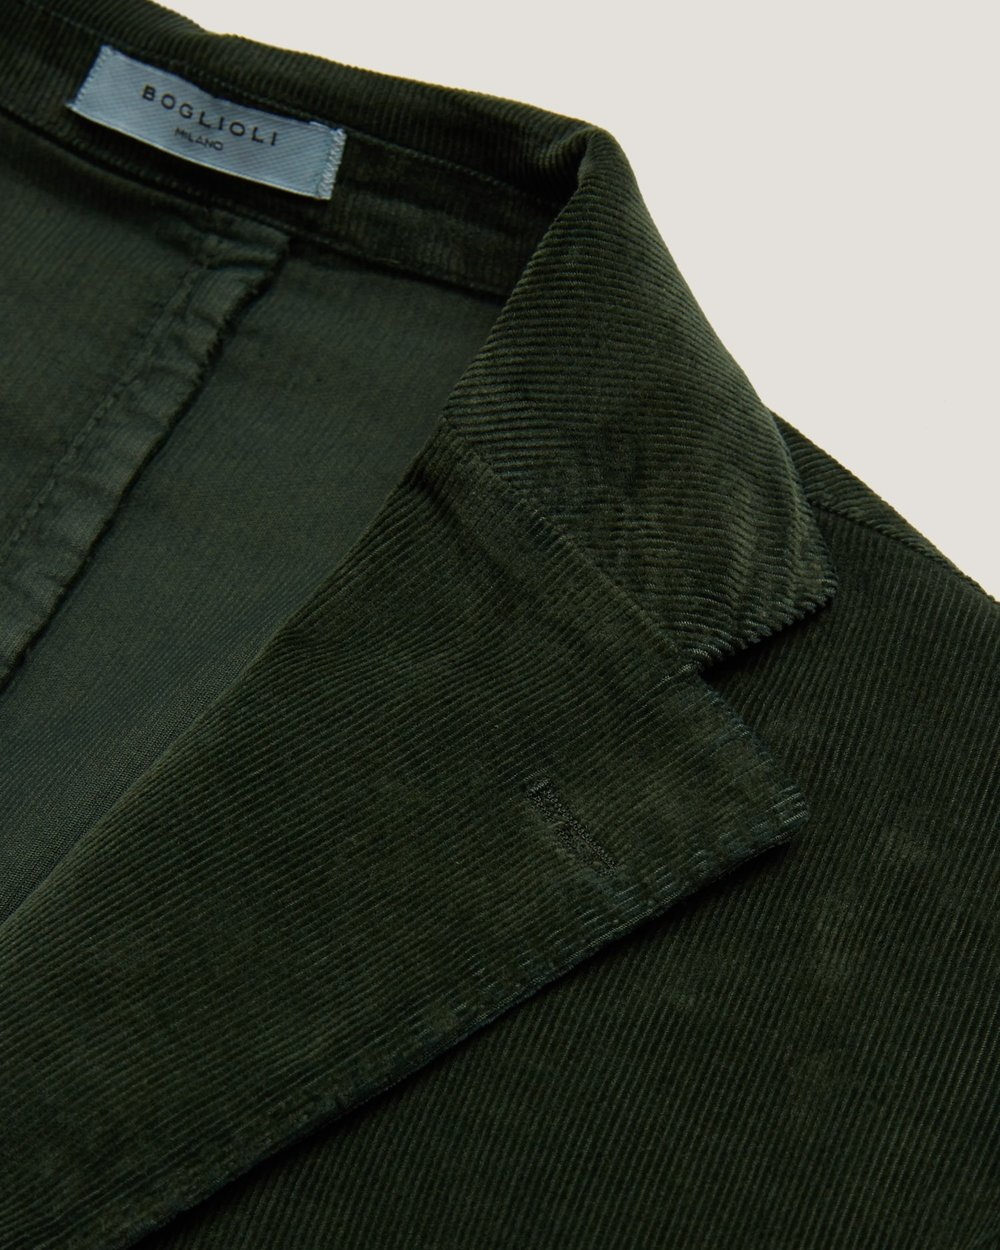 boglioli_washed_cord_k_jacket_green_4.jpg